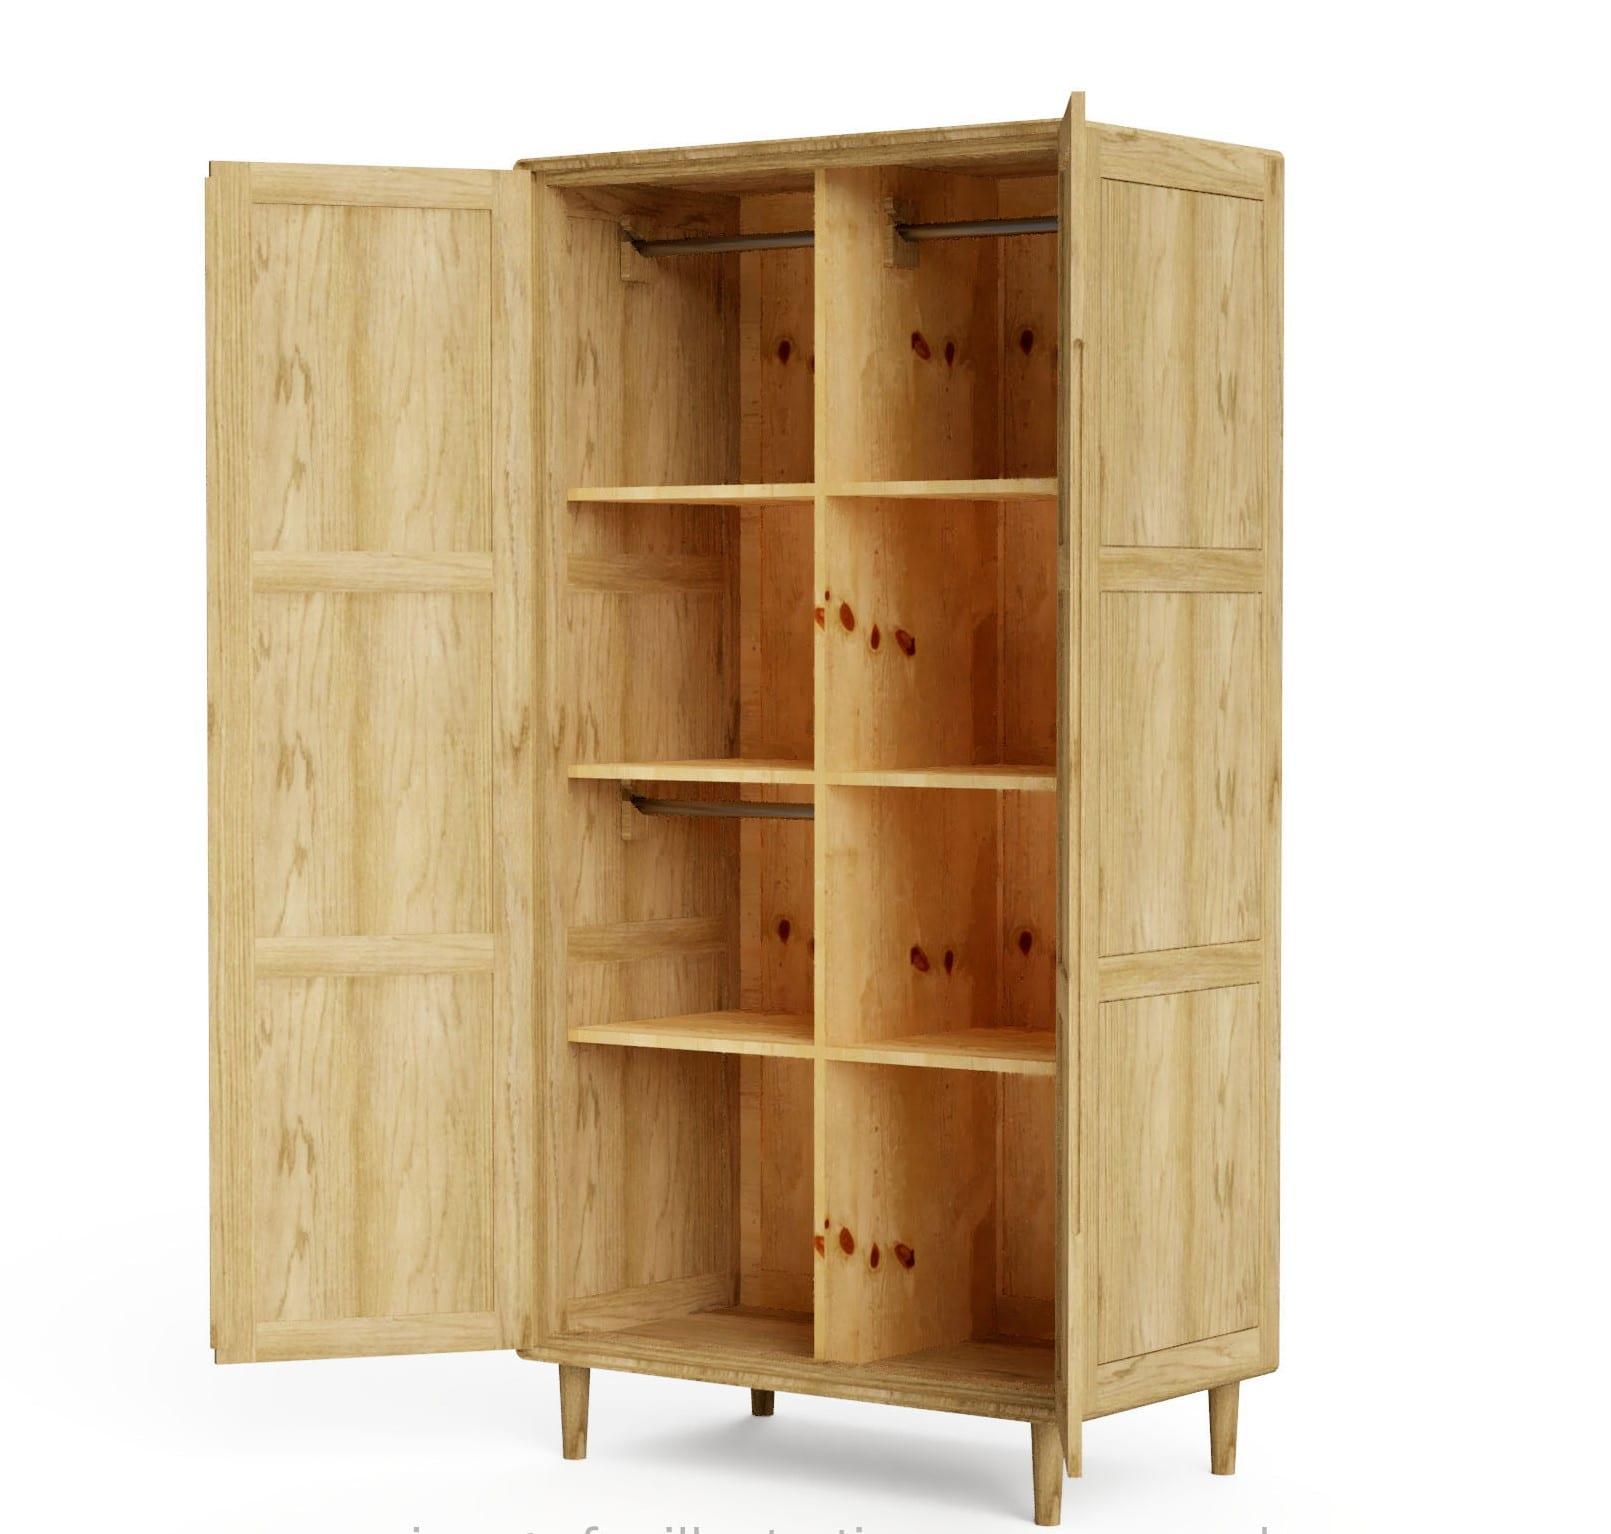 SCAROBE scandic wardrobe open